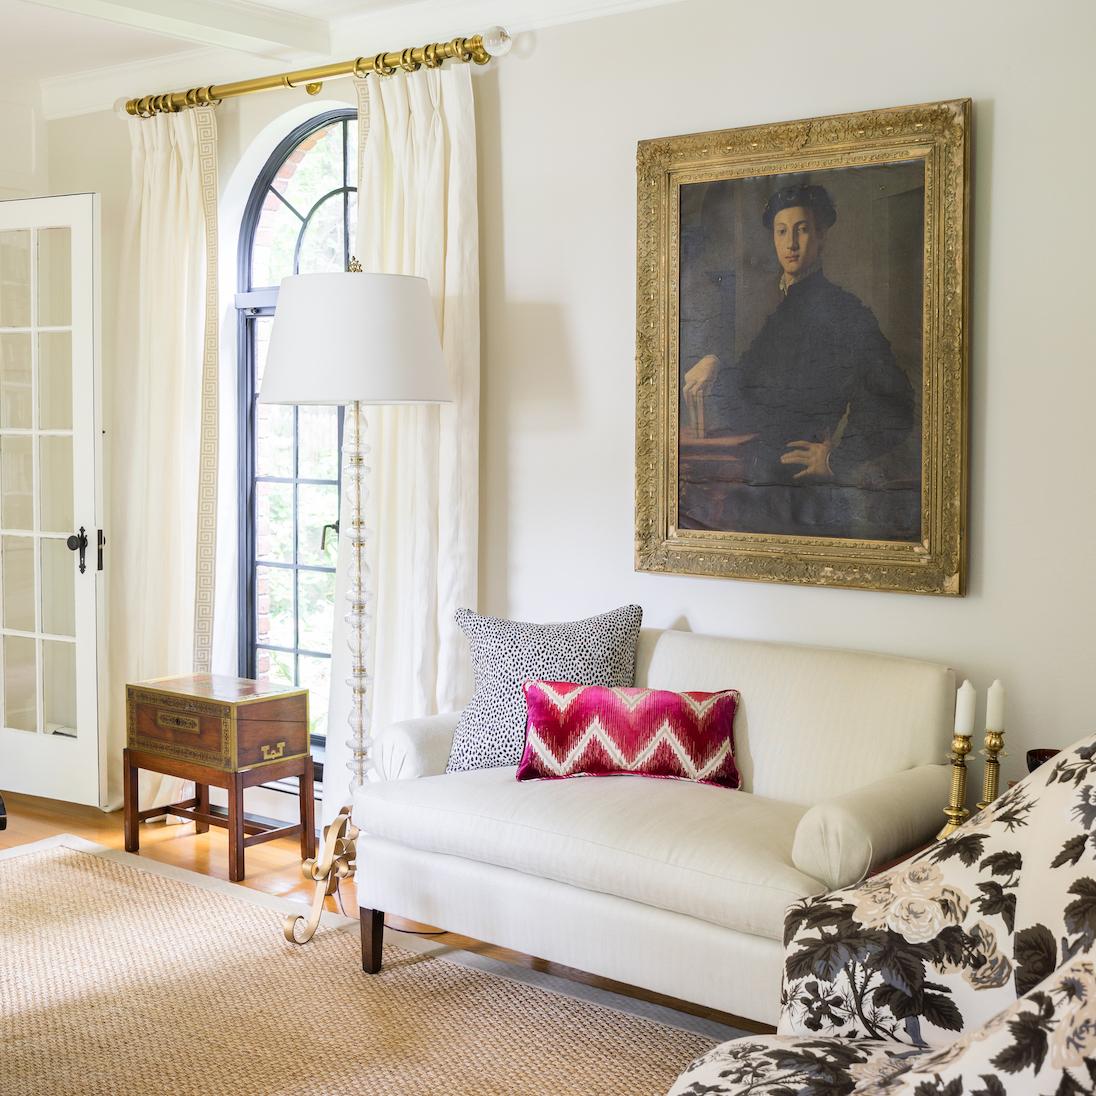 newton-ma-interior-design-antique-wall-art